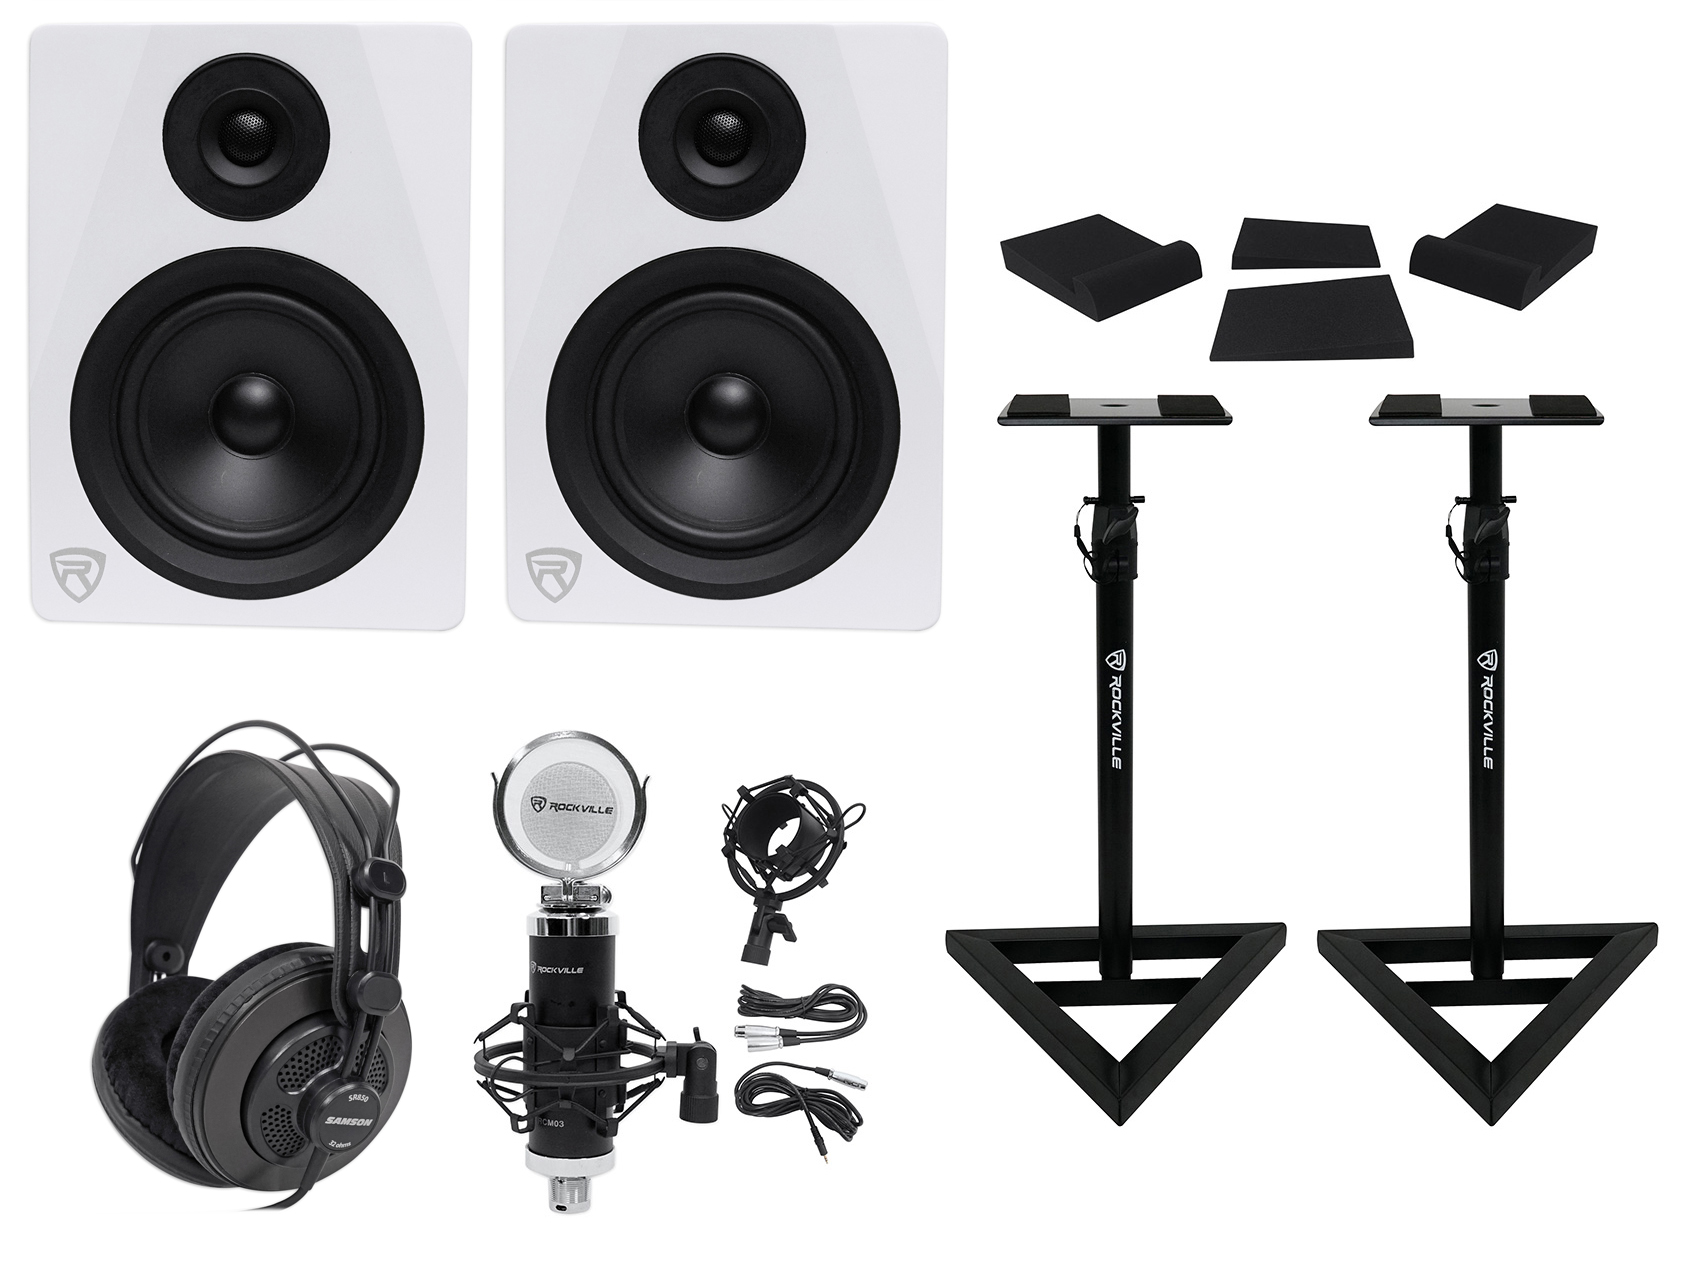 "(2) Rockville DPM5W 5.25"" 300w Dual Active Studio Monitors+Stands+Headphones+Mic by ROCKVILLE"